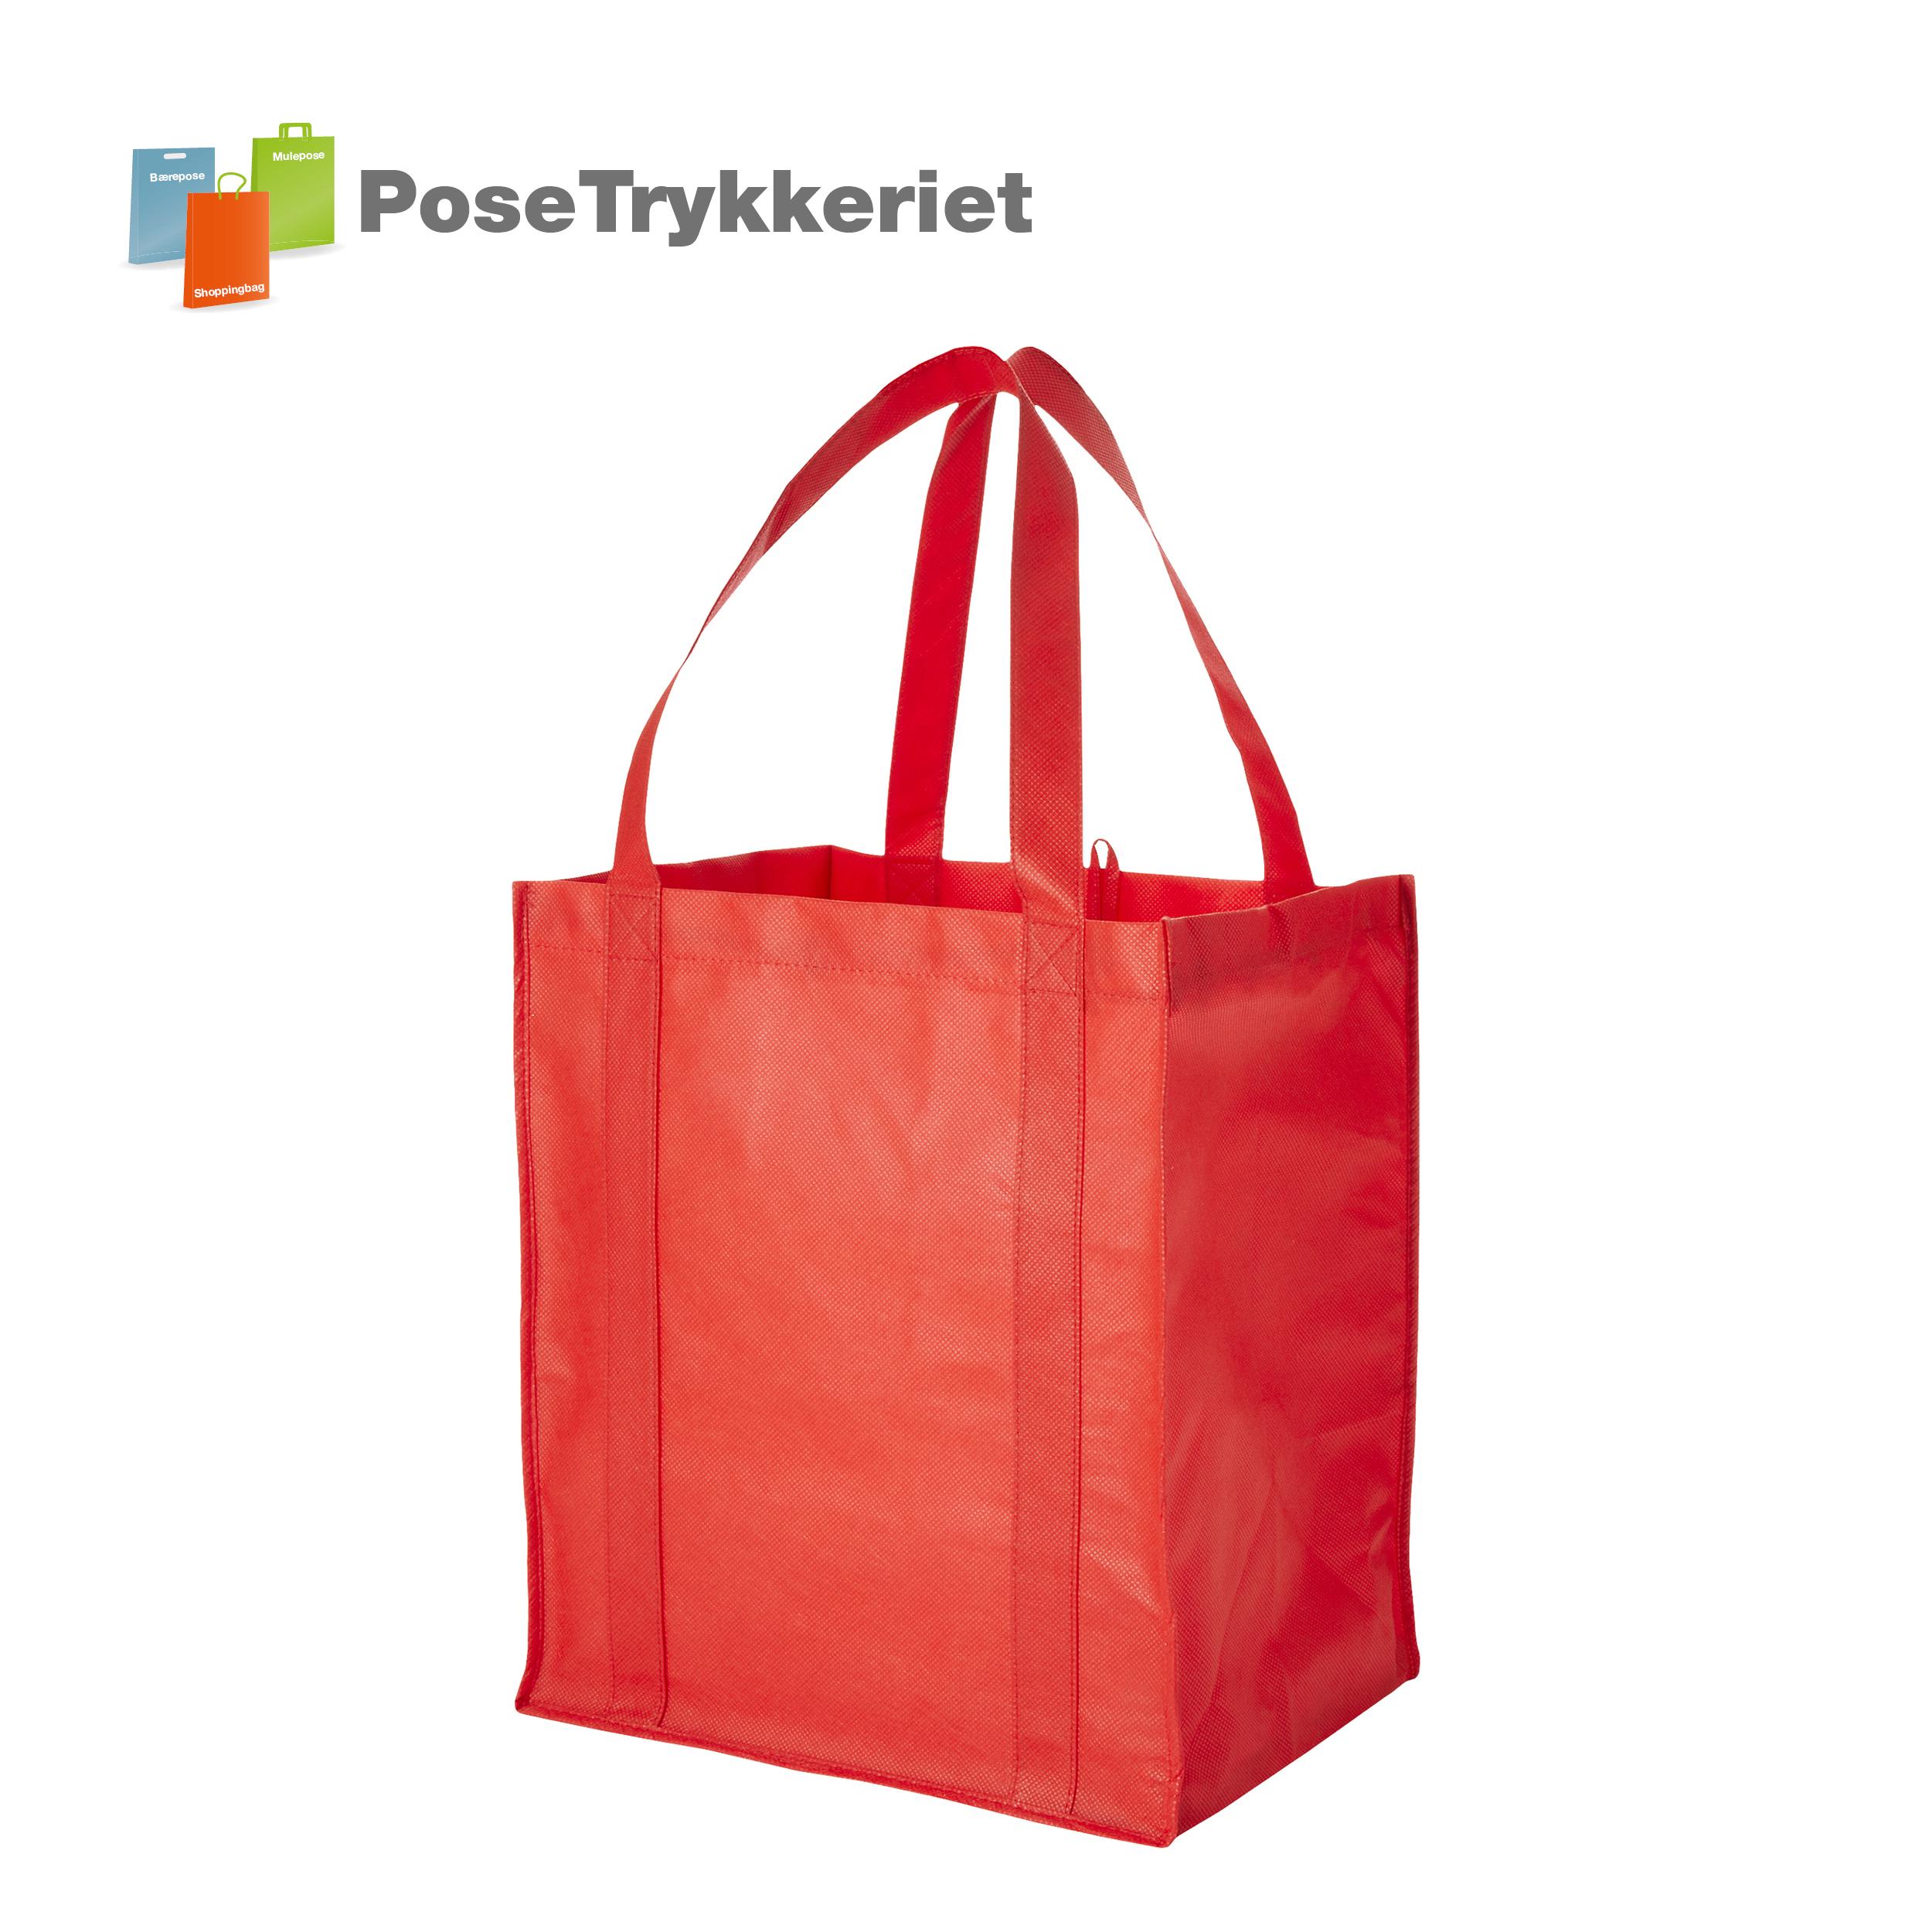 Nonwoven net med logotryk PoseTrykkeriet.dk